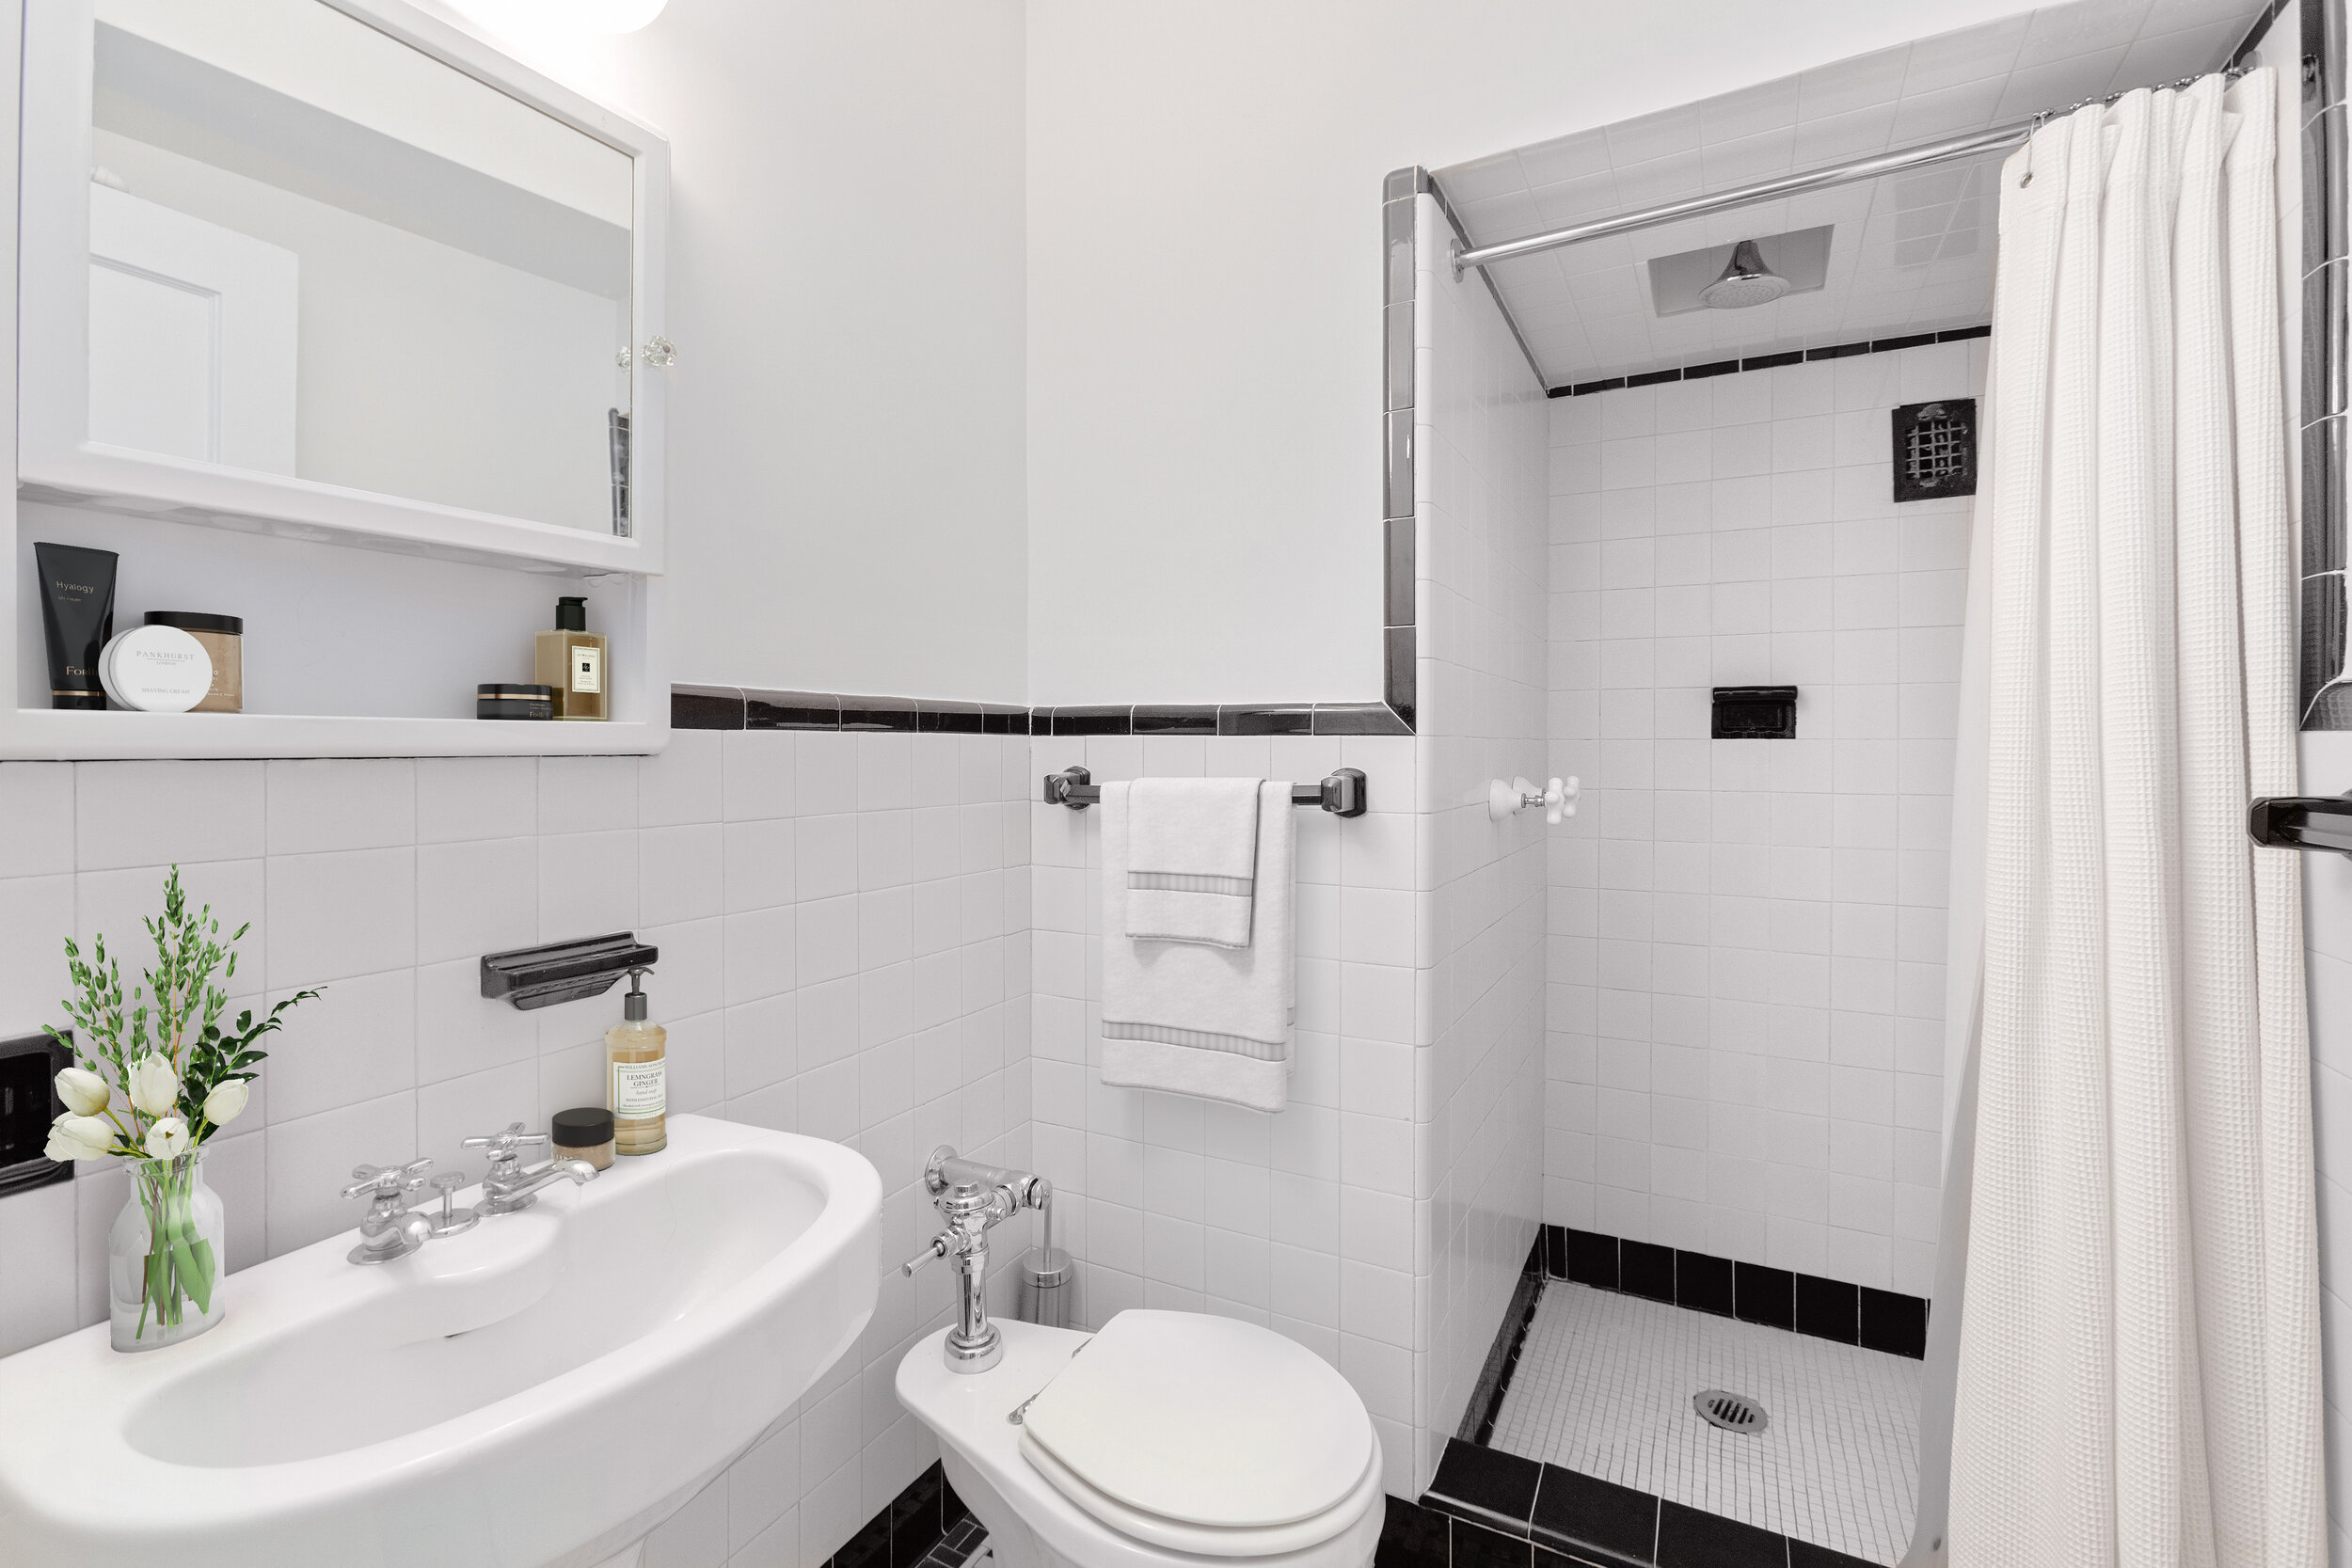 Andrew-7 West 96th St-Bathroom-staged-ab.jpg